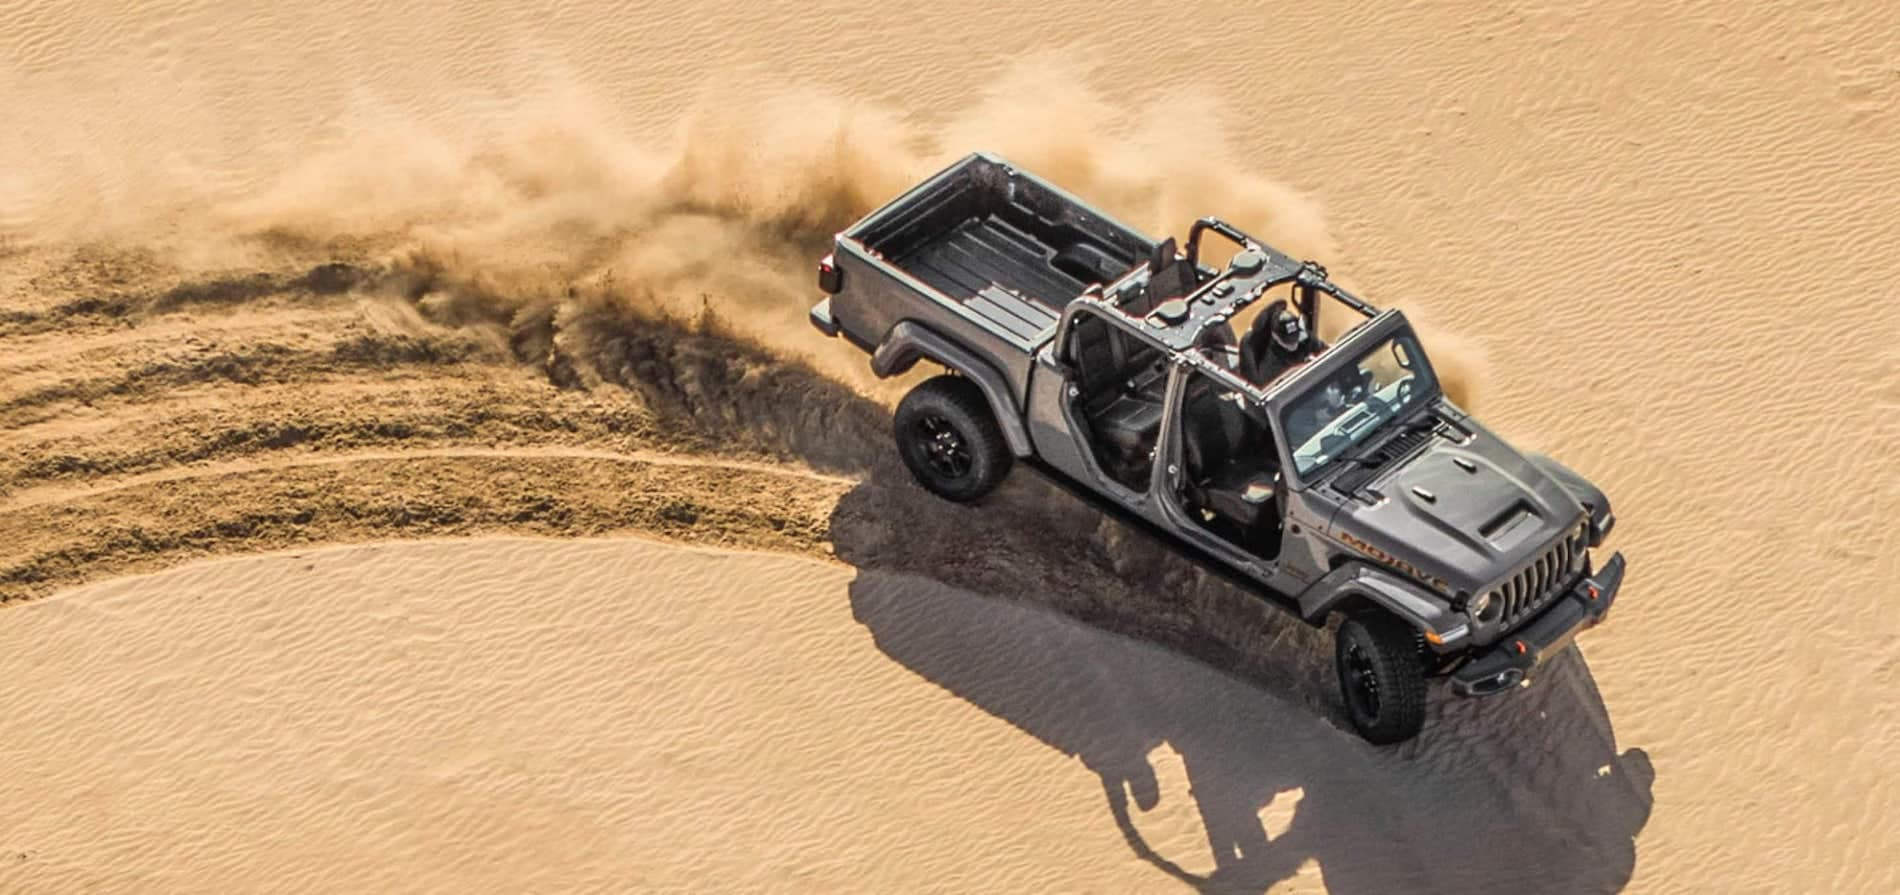 2021 Jeep Gladiator Engine Options Salisbury, MD